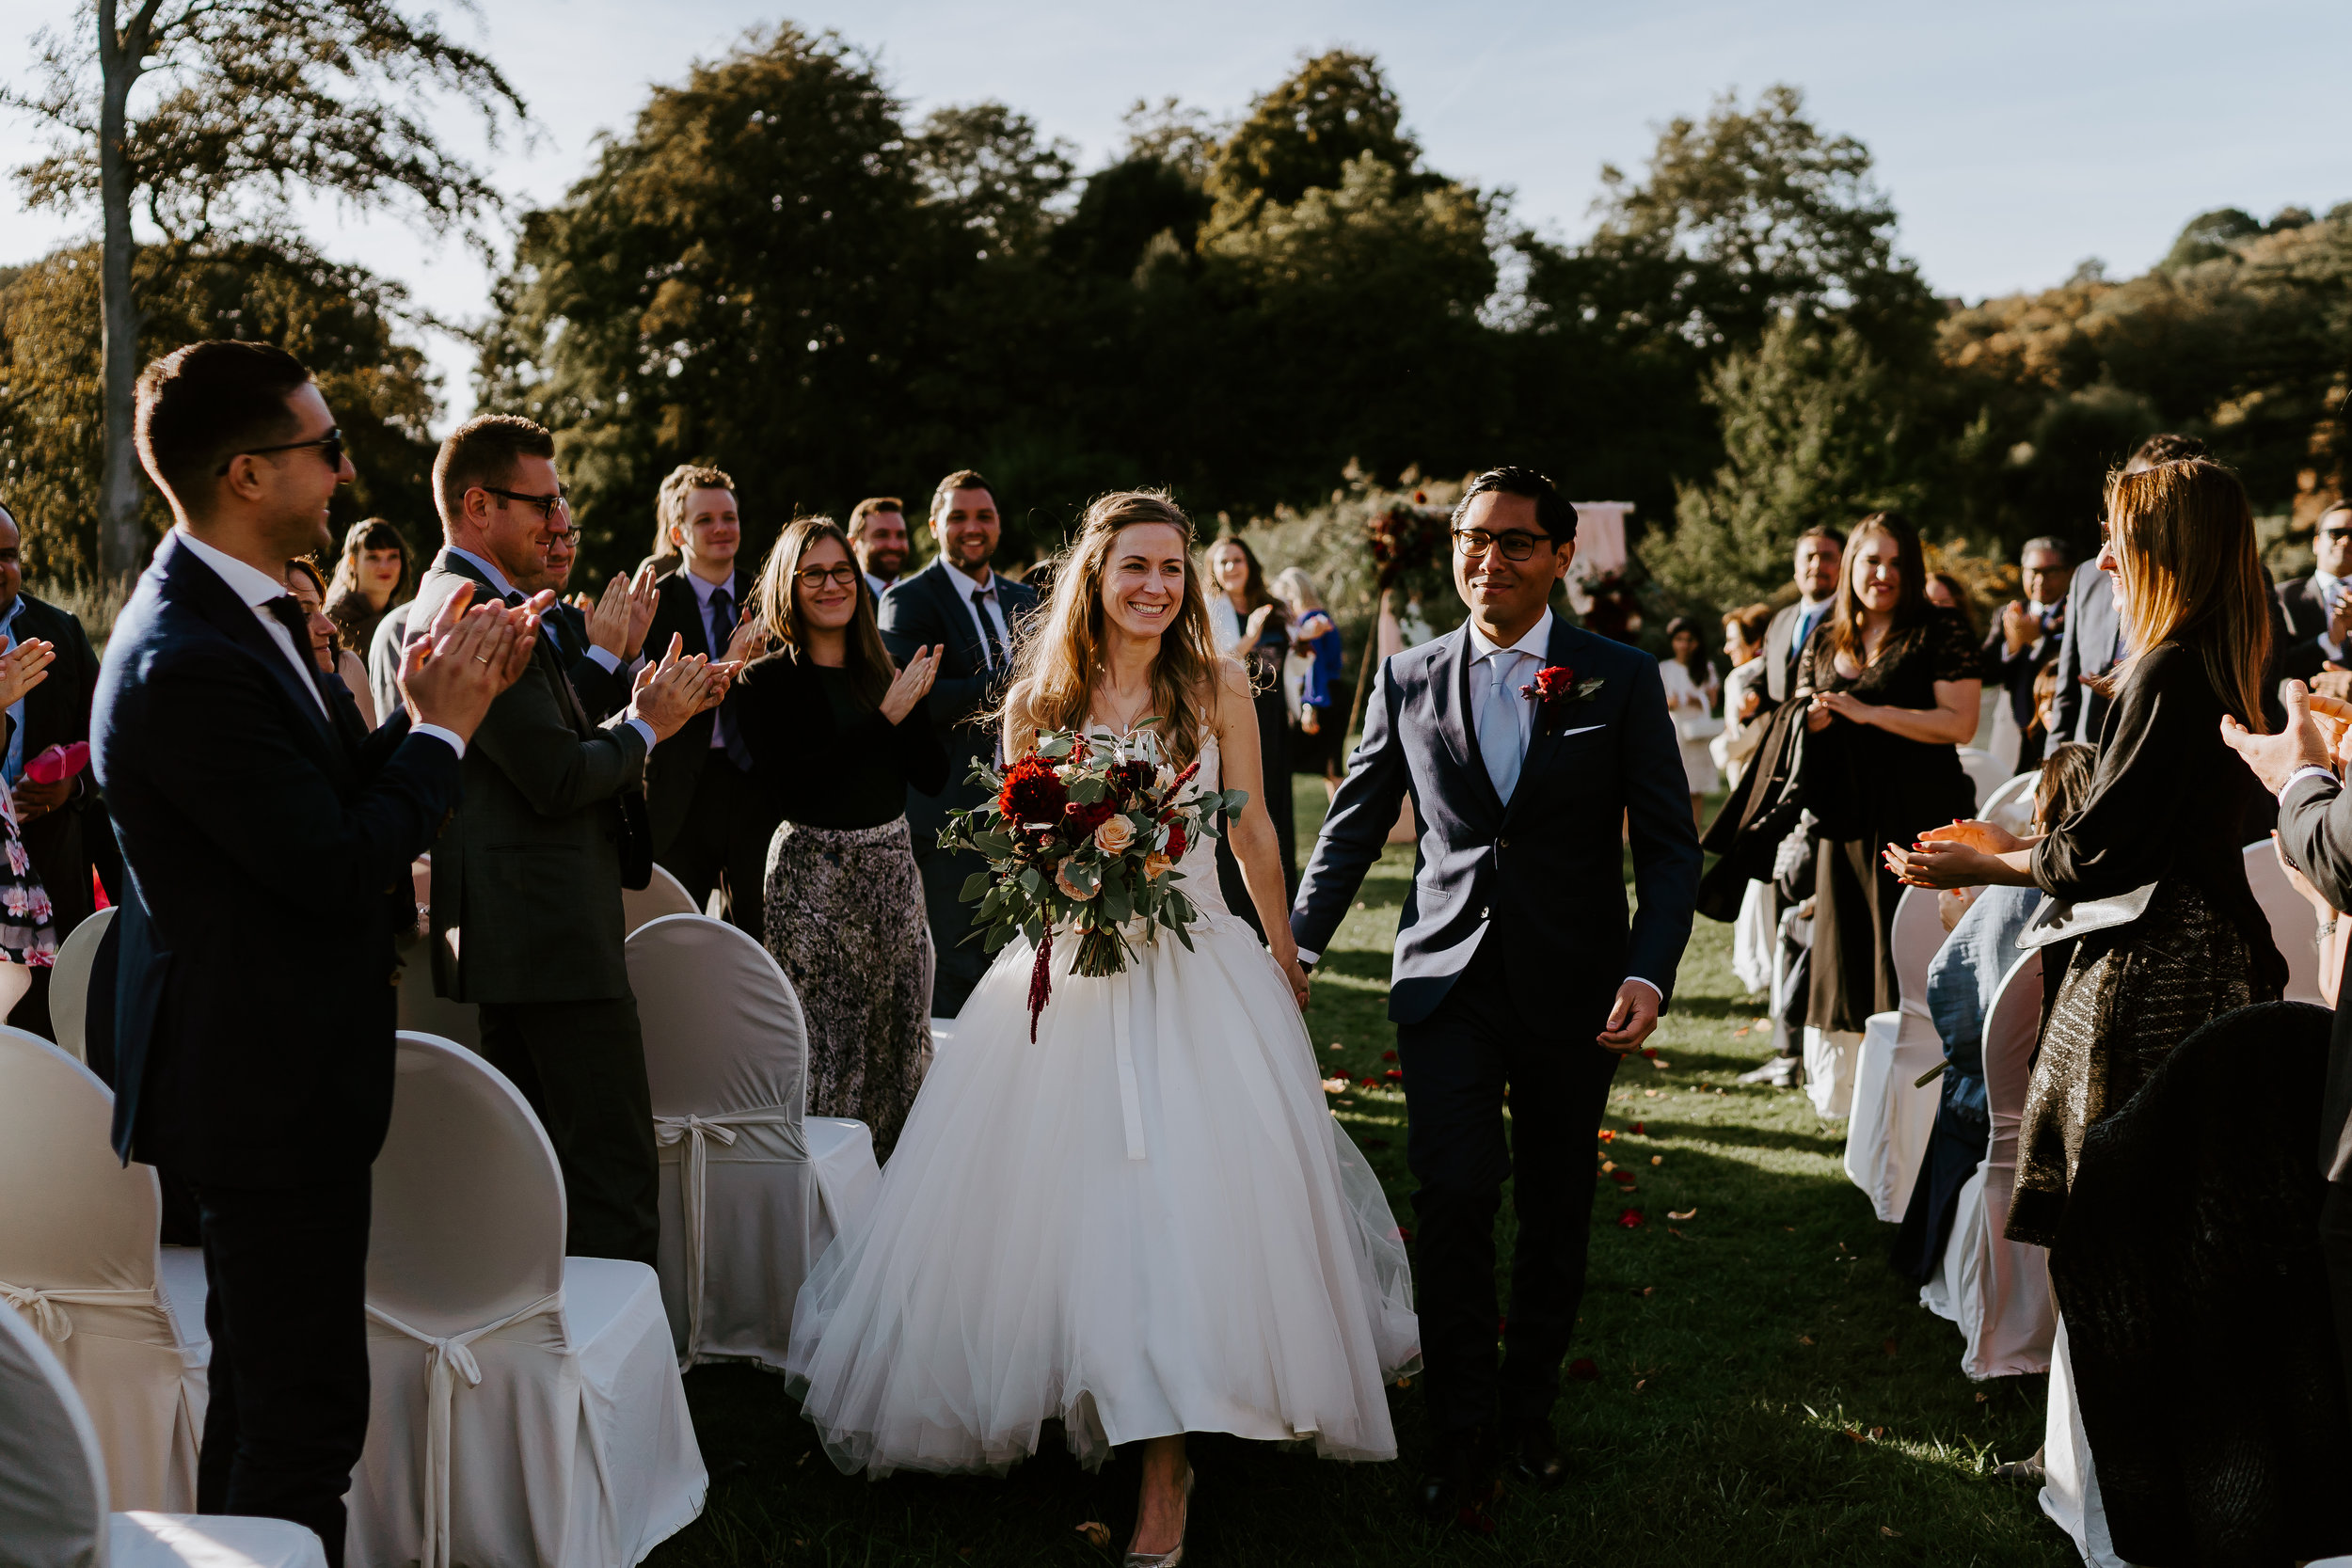 bruiloft-altembrouck-overthemoonweddings42.jpg